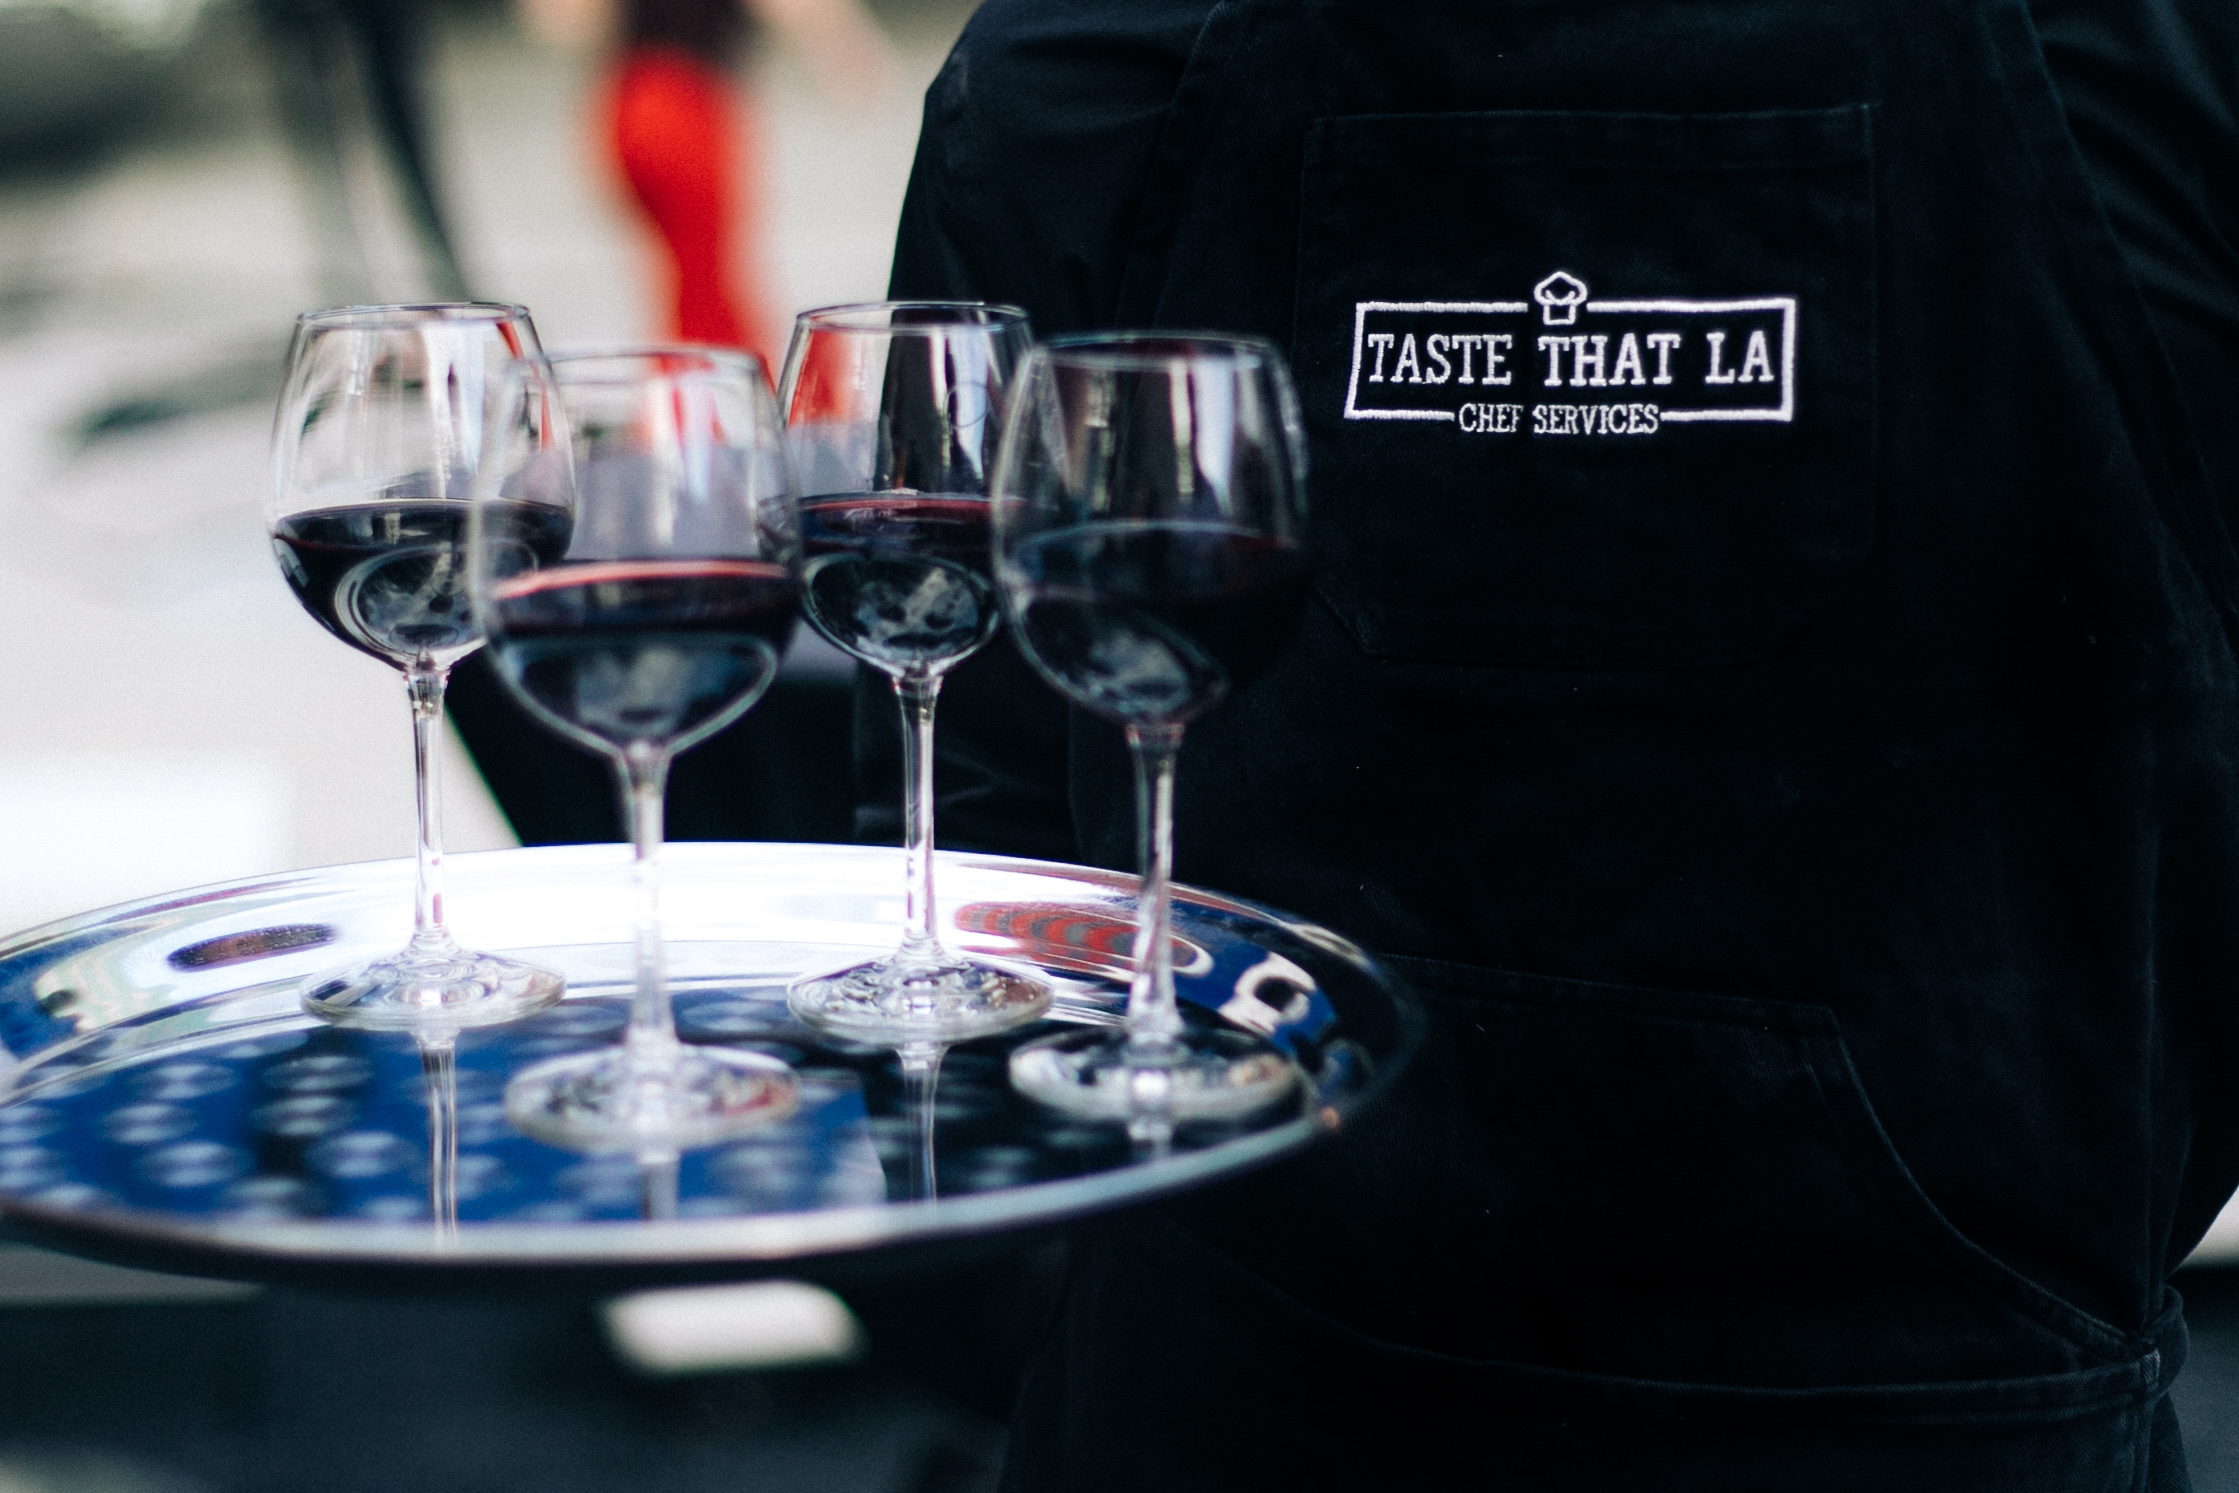 TasteThatLA wine service